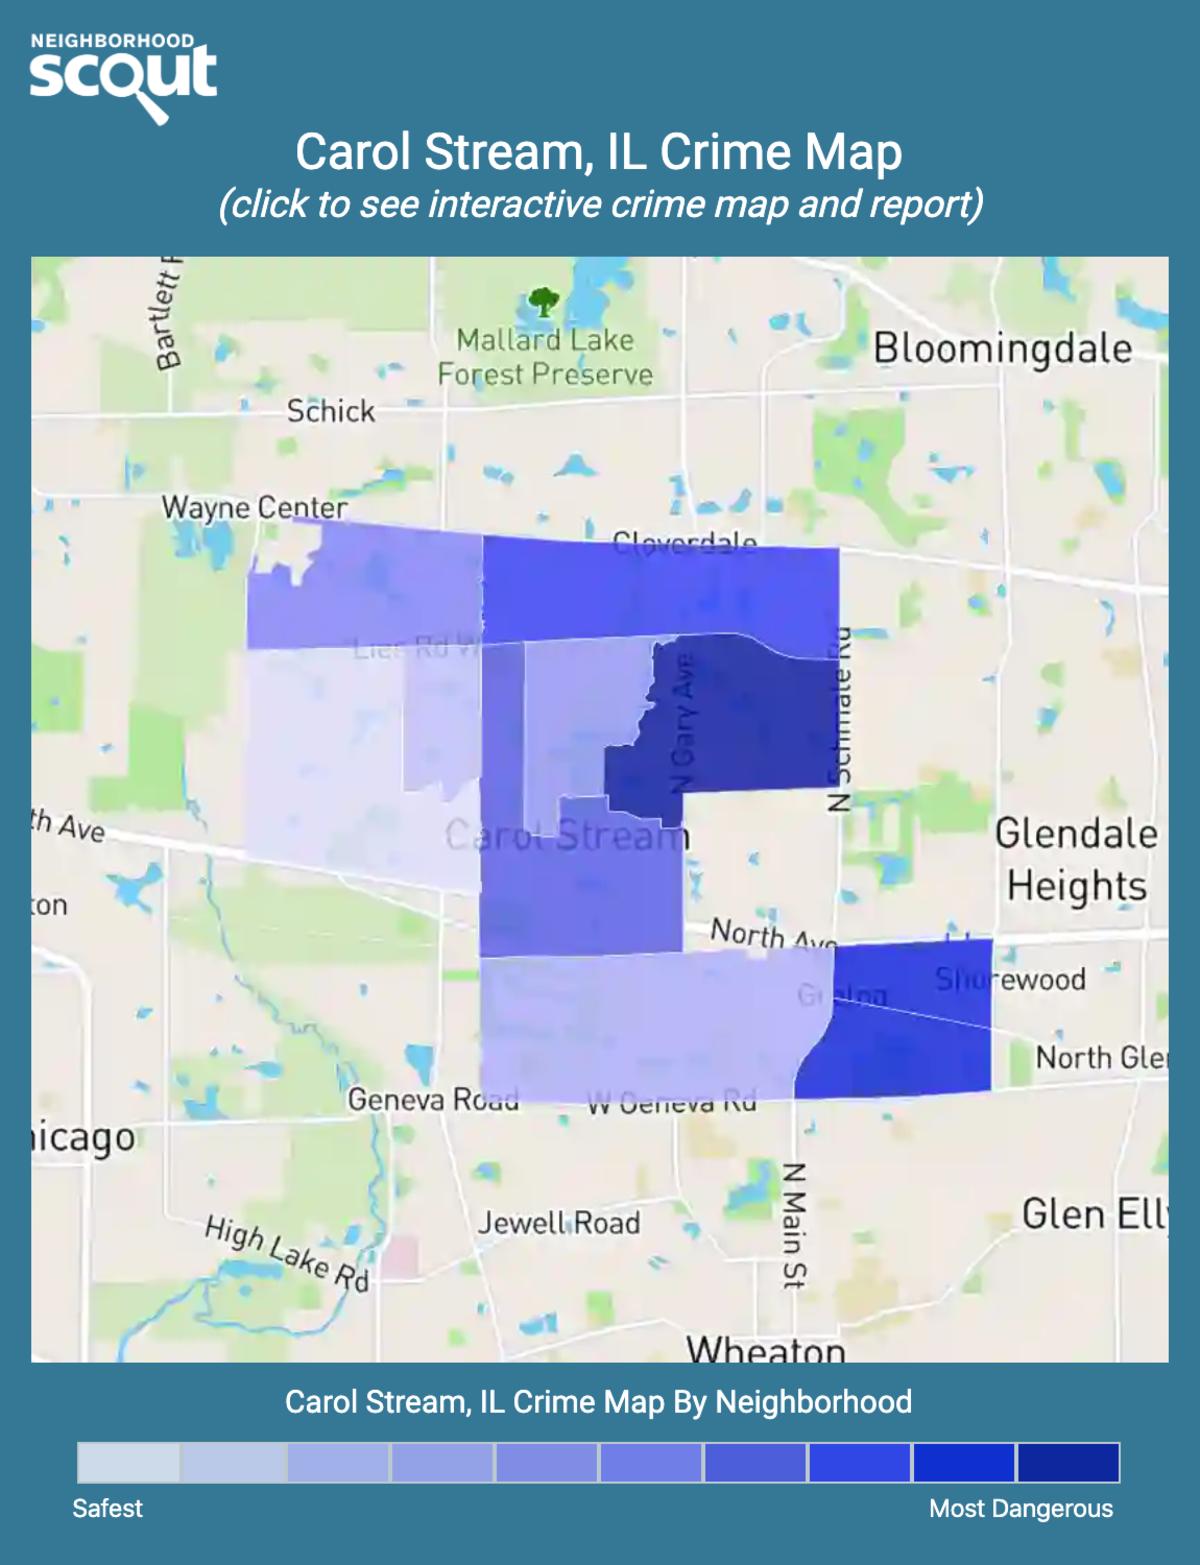 Carol Stream, Illinois crime map